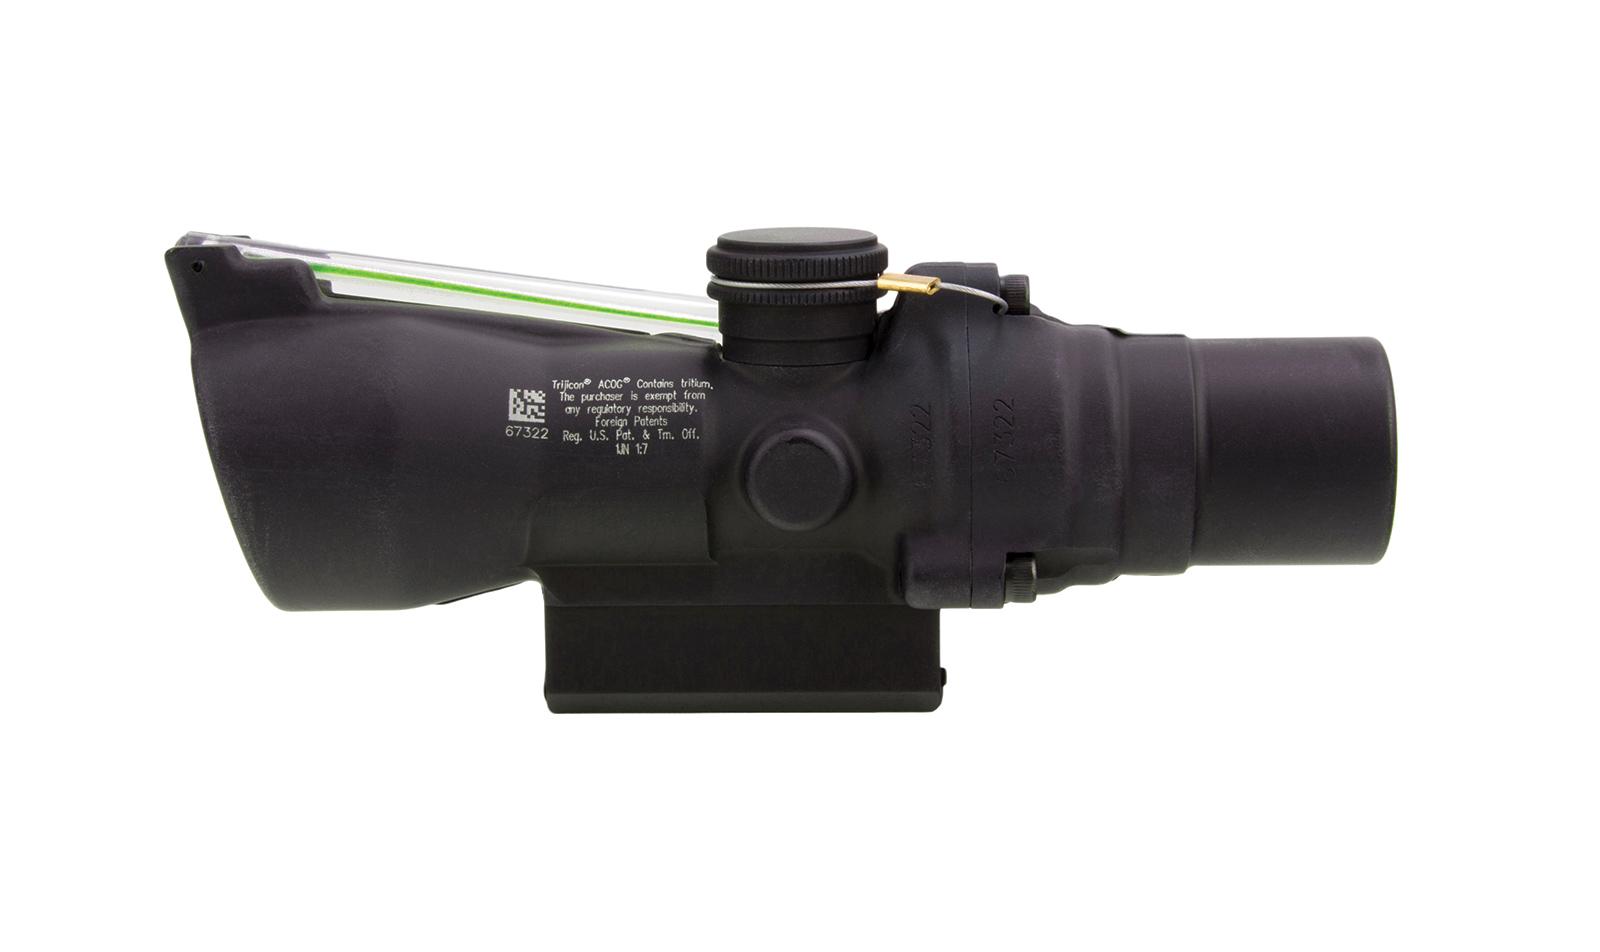 TA47-C-400149 angle 2